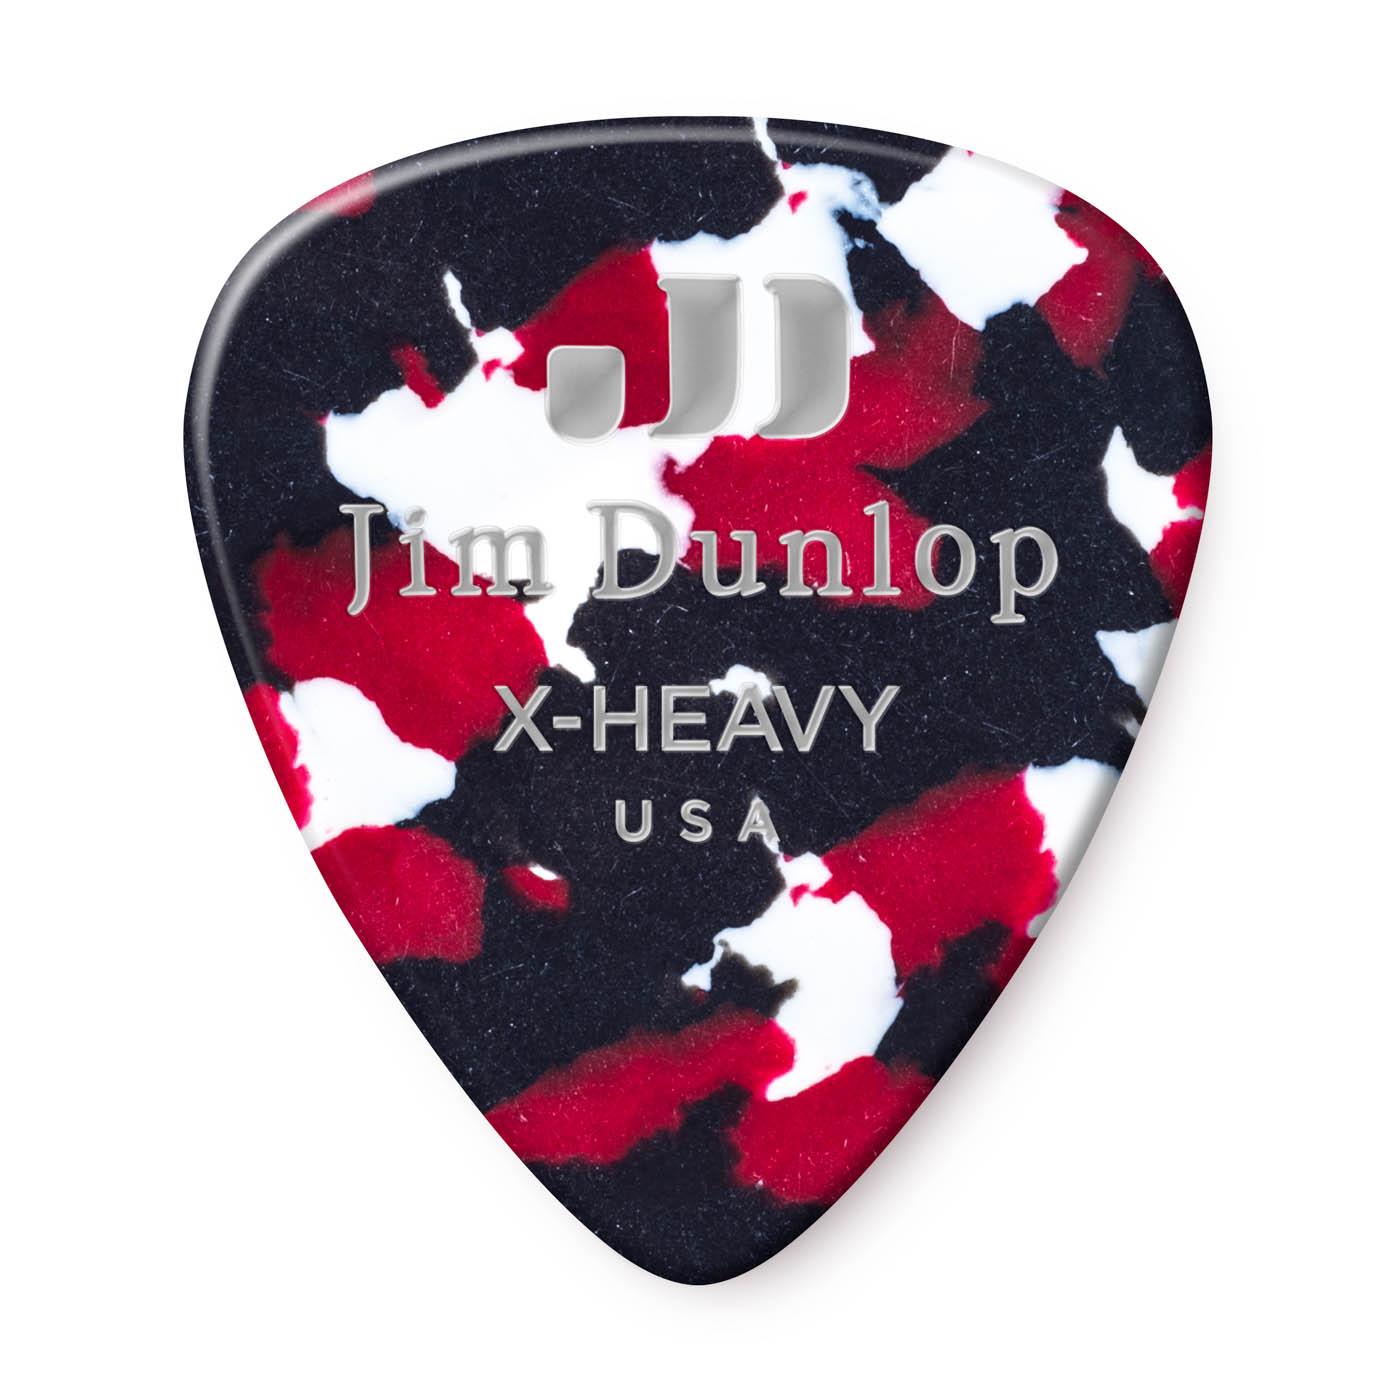 Dunlop - Confetti extra heavy